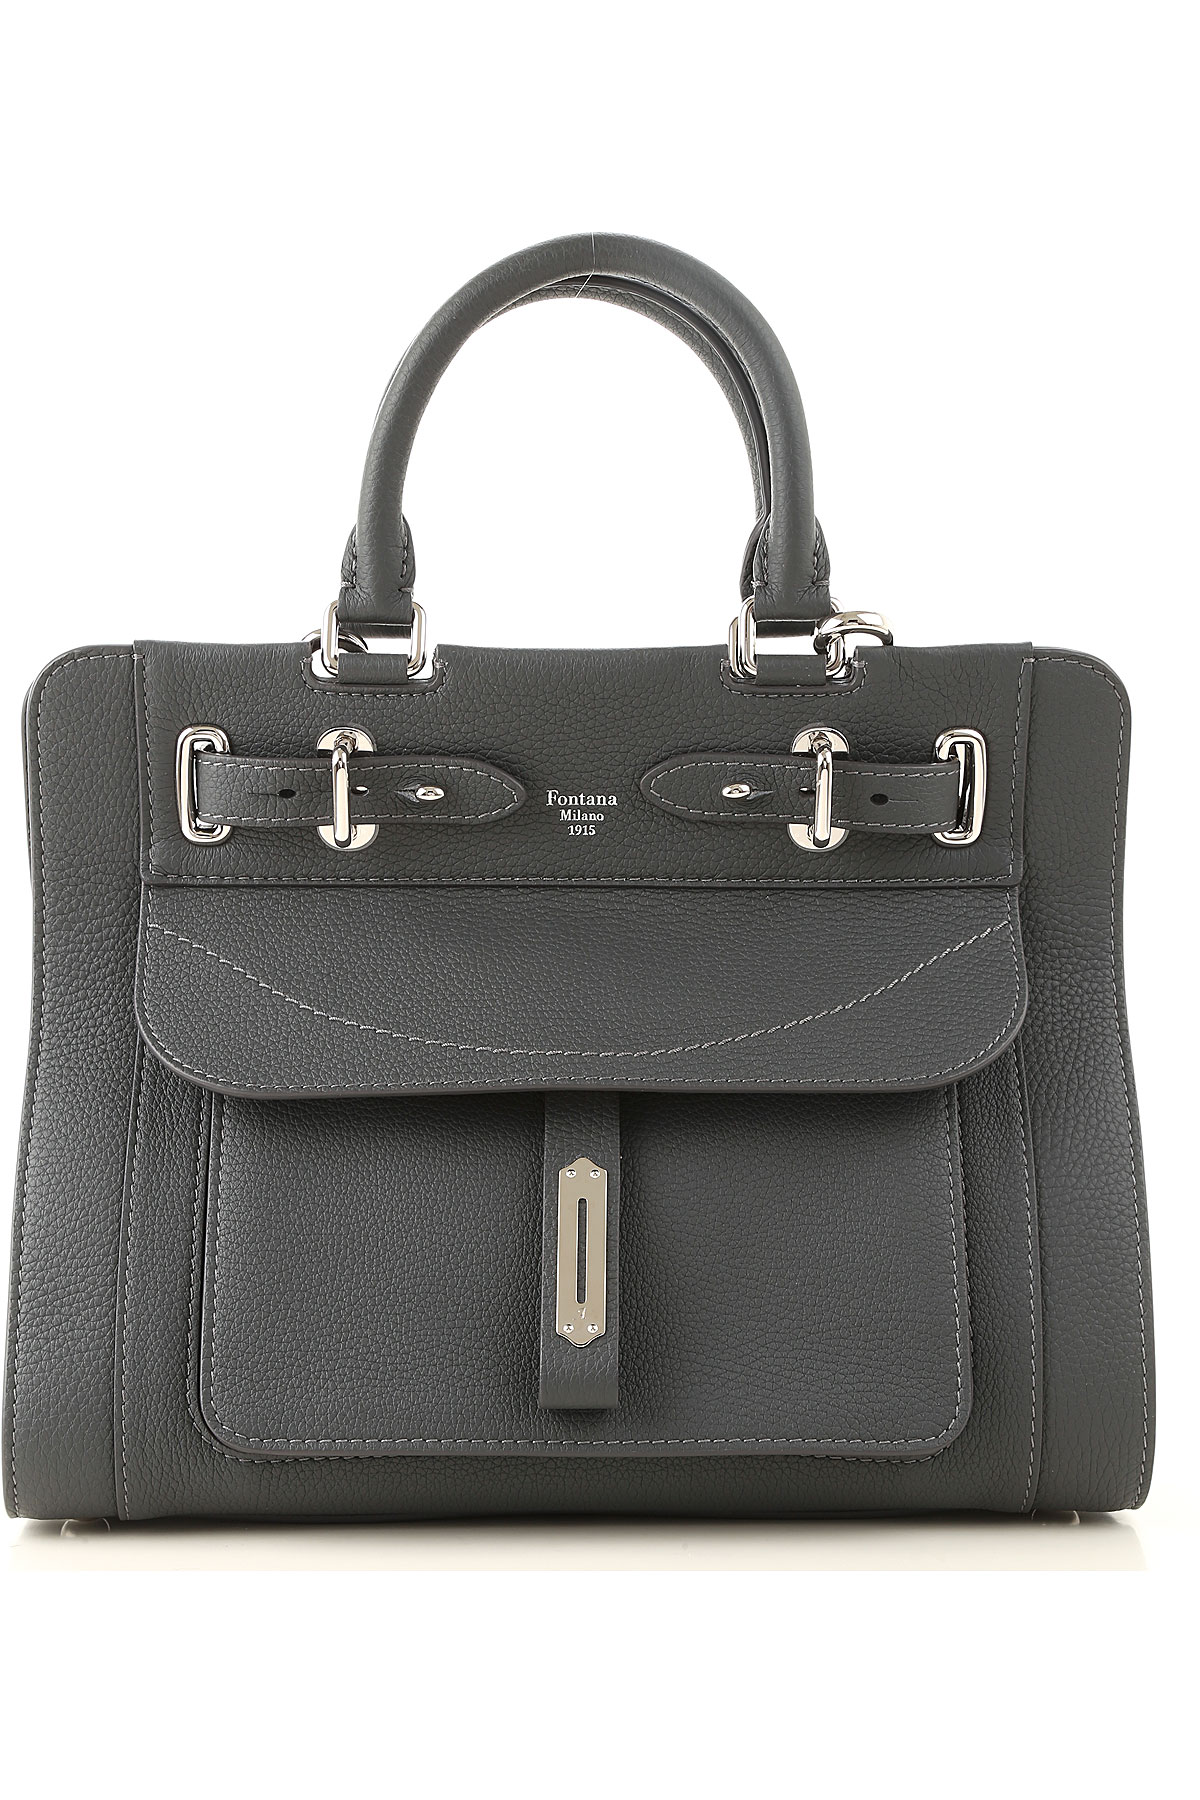 Fontana Top Handle Handbag, Rock, Crackle Leather, 2019